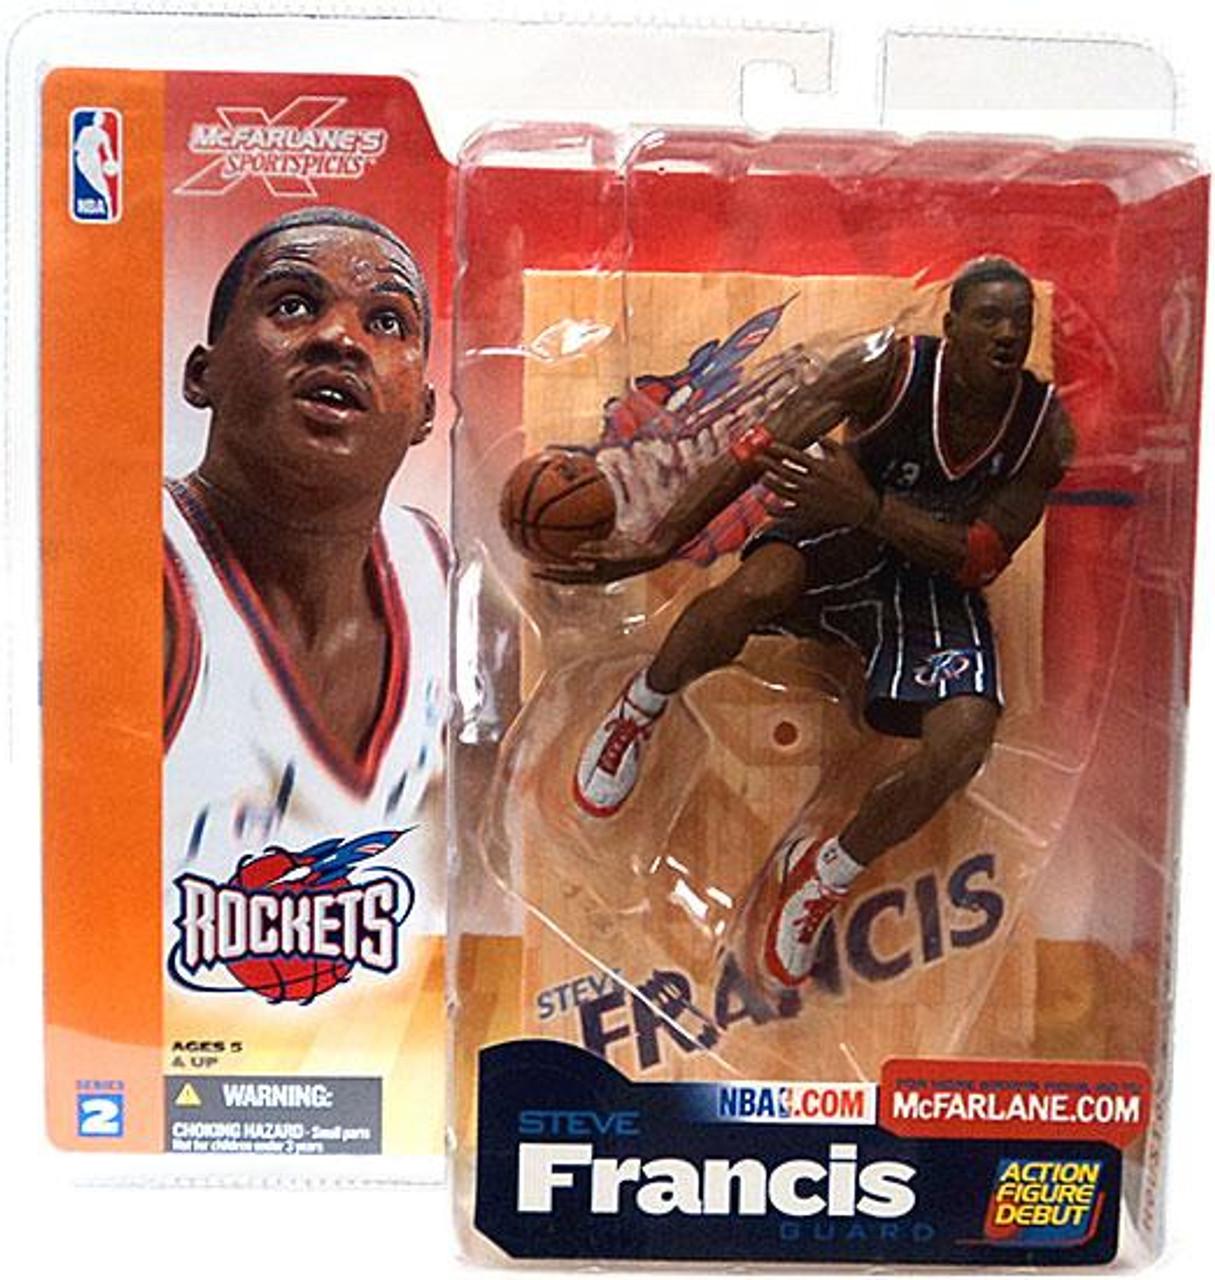 McFarlane Toys NBA Houston Rockets Sports Picks Series 2 Steve Francis Action Figure [Dark Blue Jersey Variant]